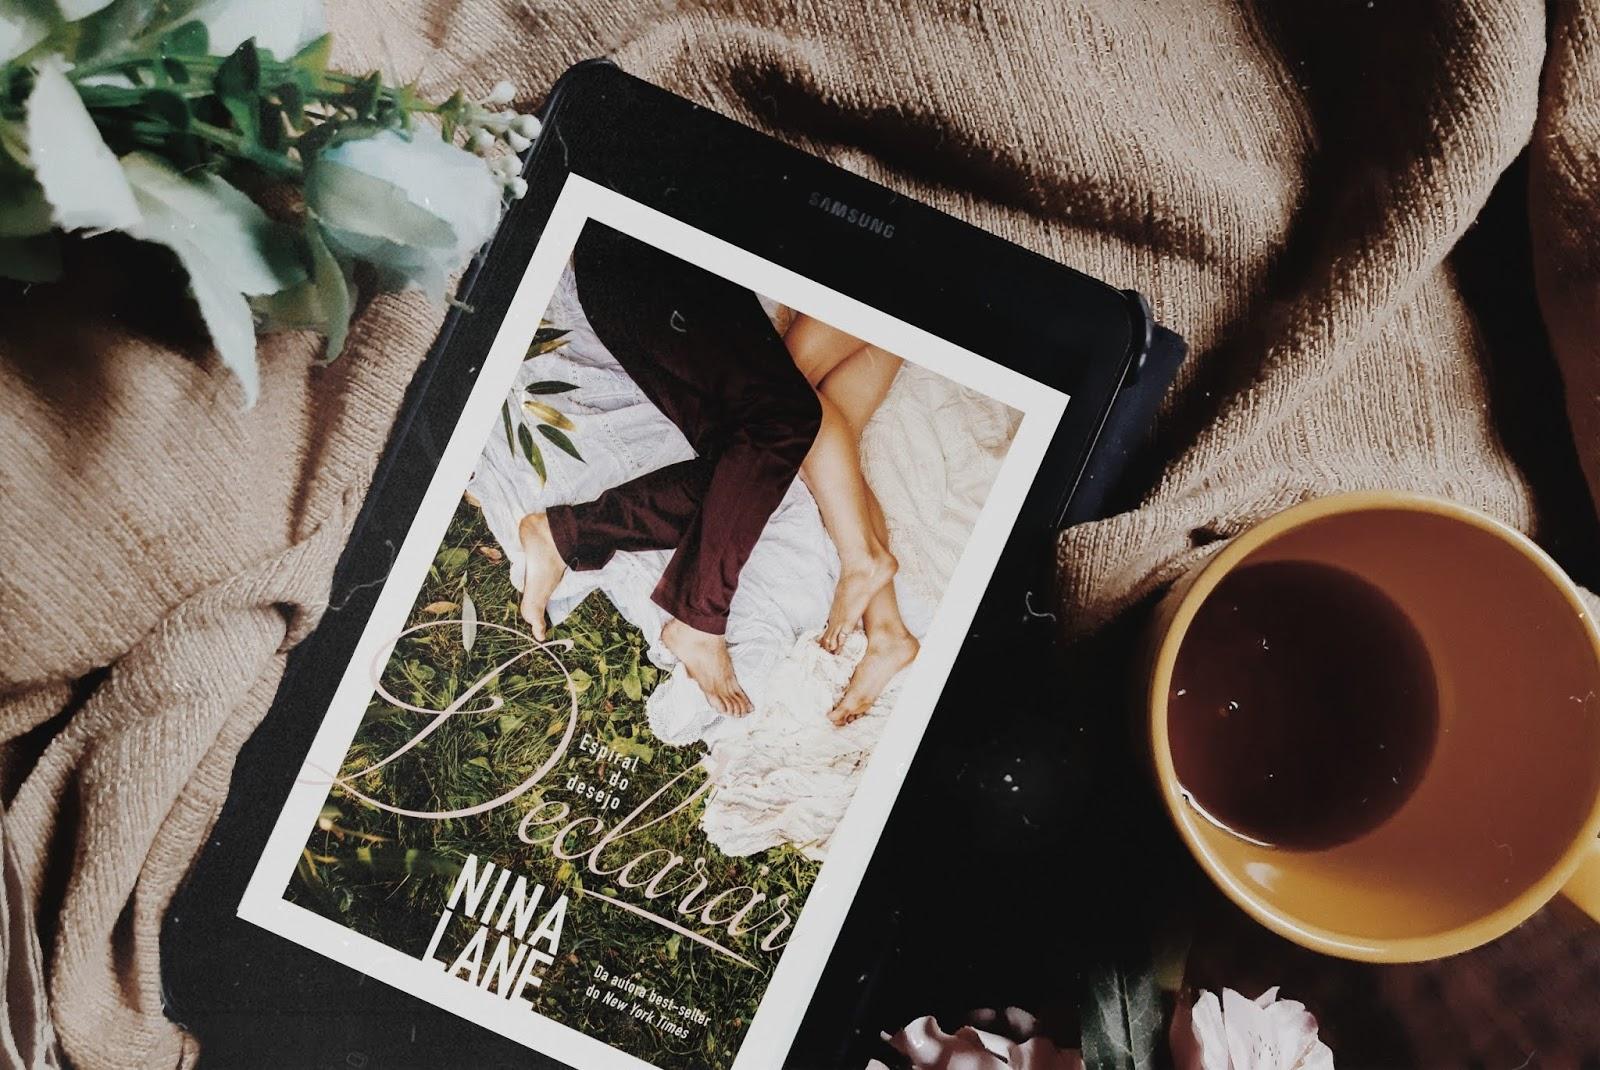 Declarar - Nina Lane | Resenha